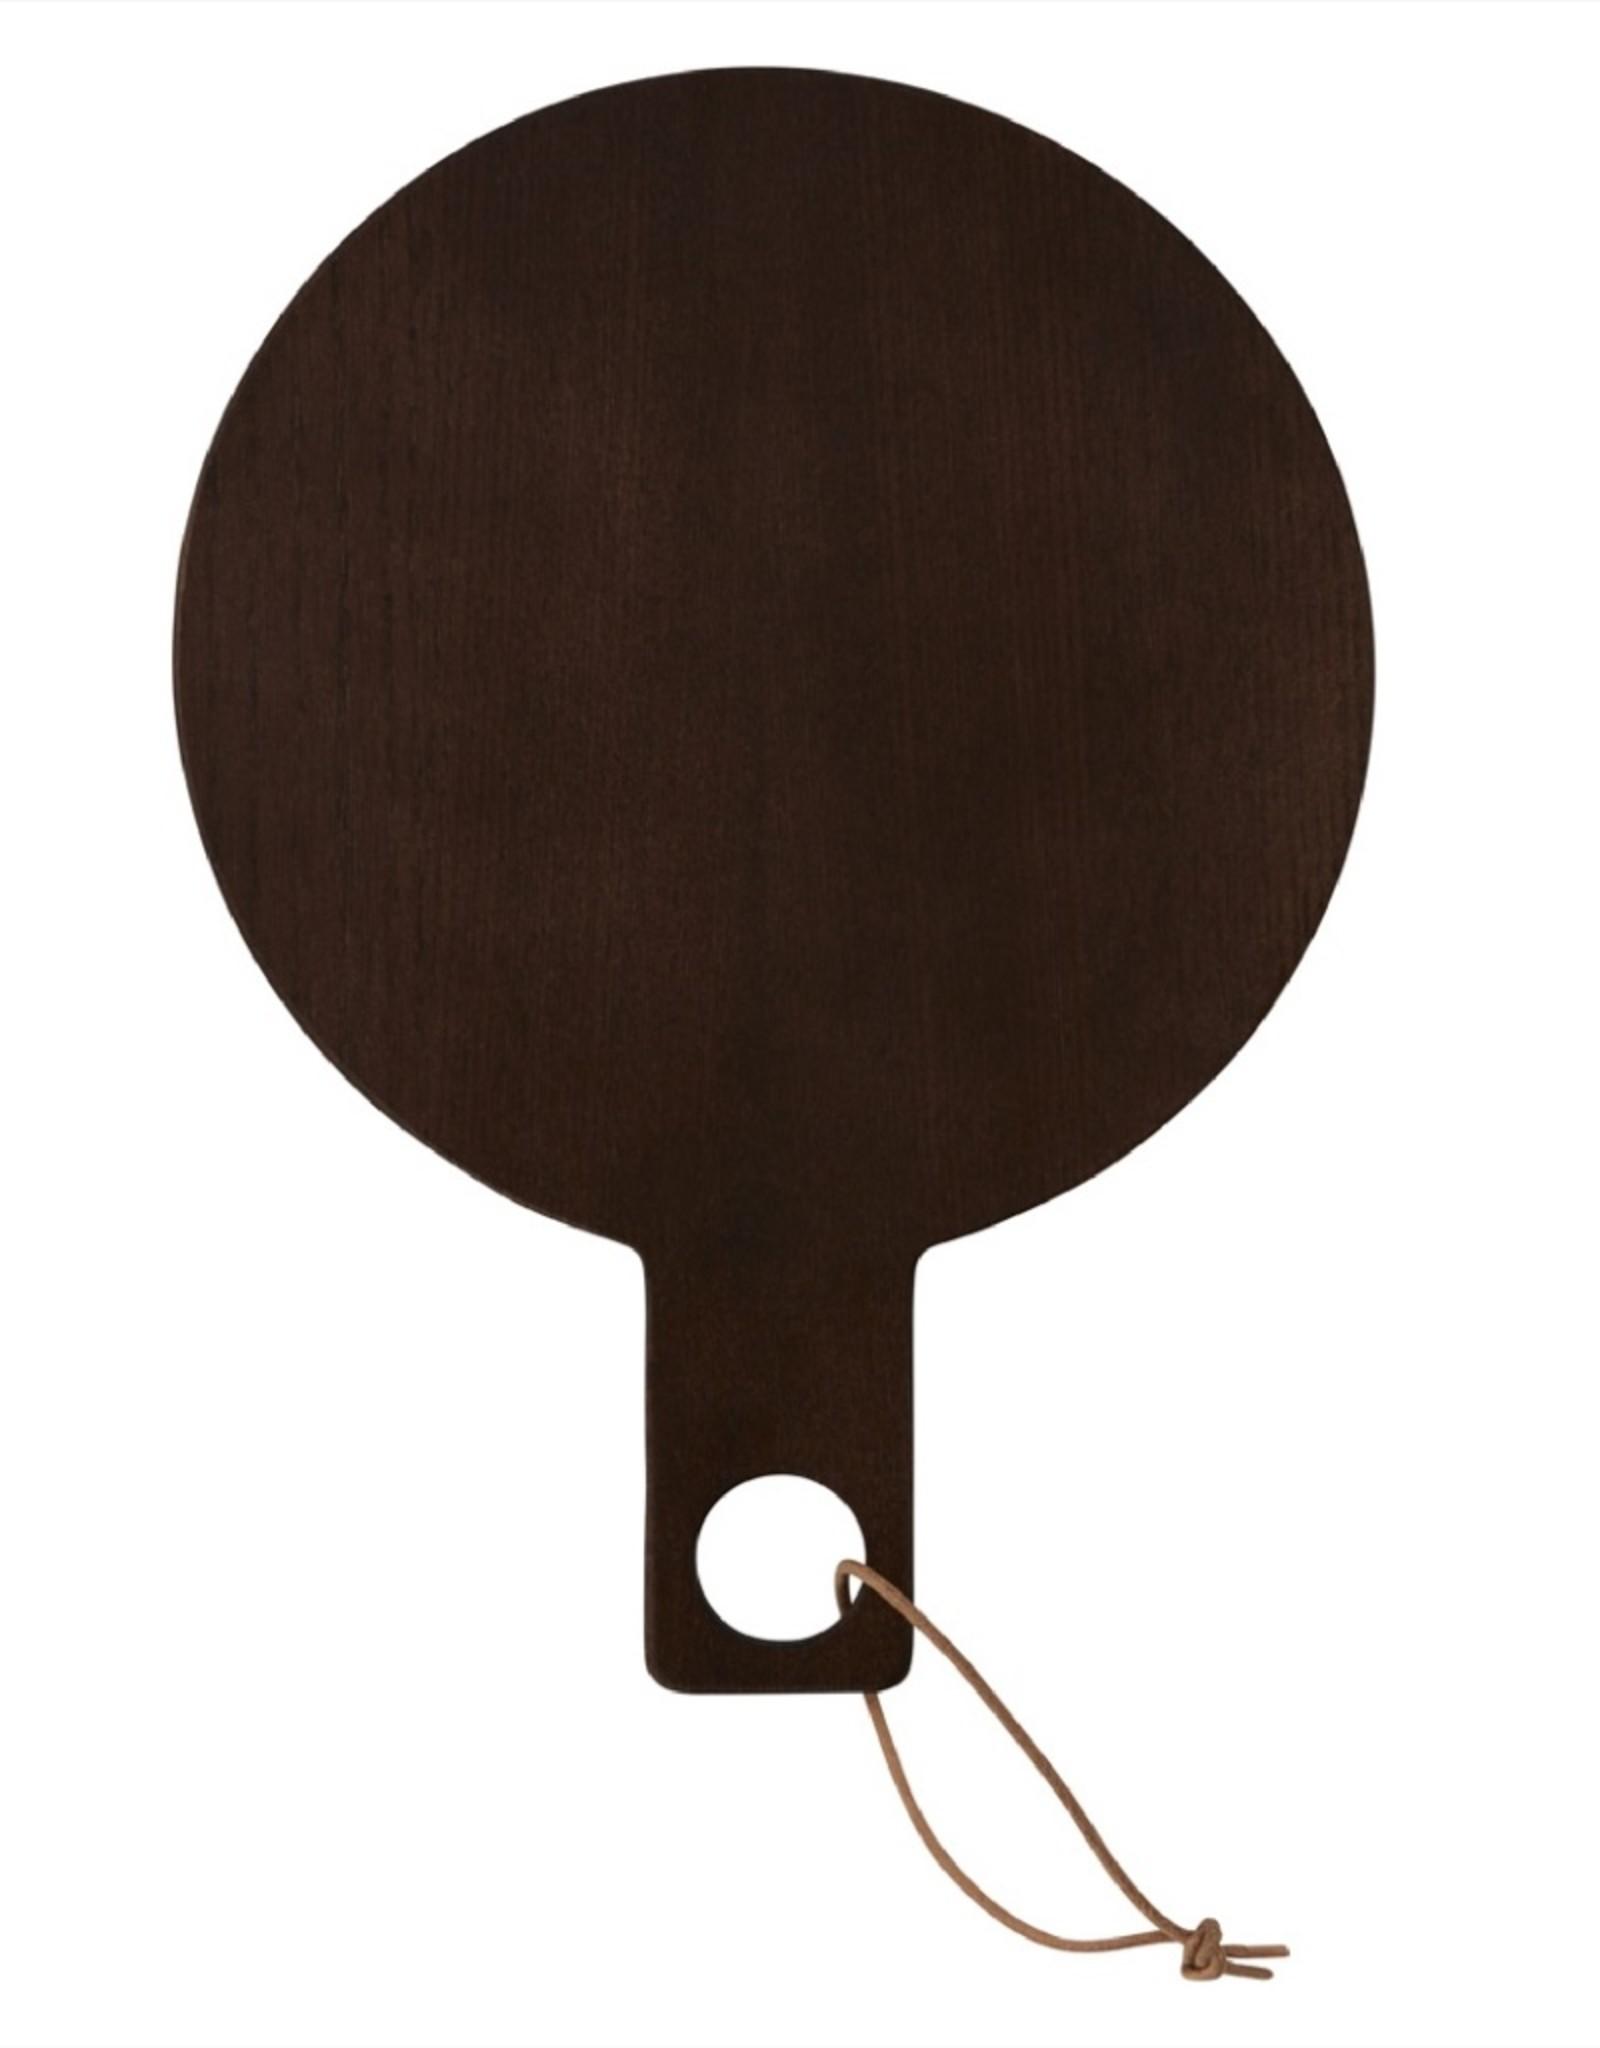 OYOY Ping Pong Handmirror